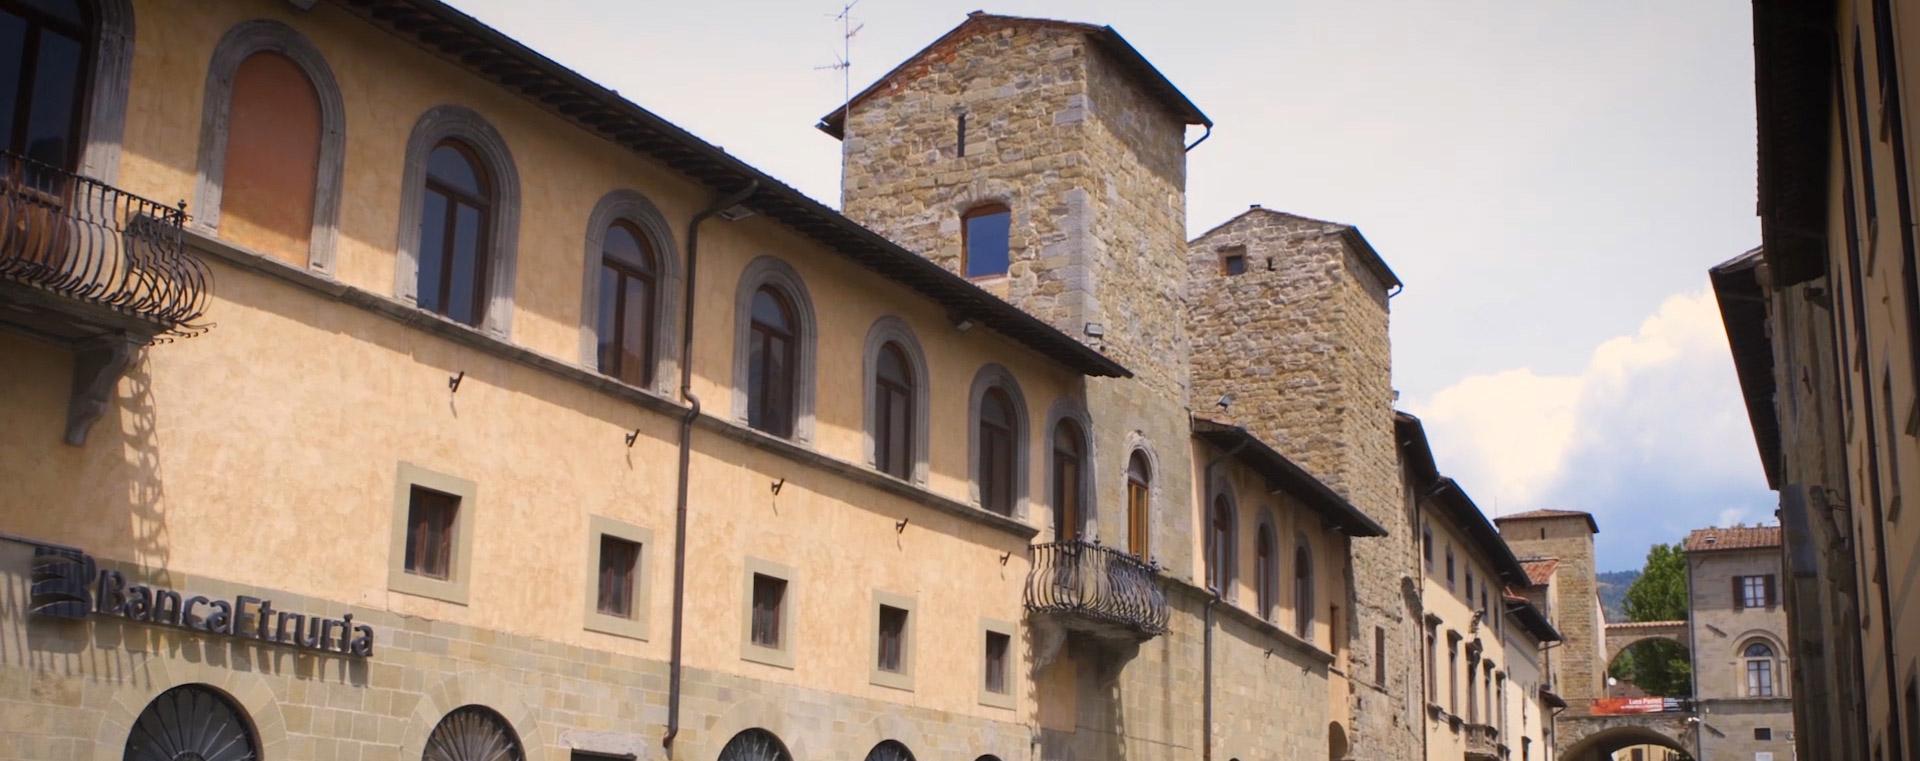 Centro Storico Sansepolcro in Toscana